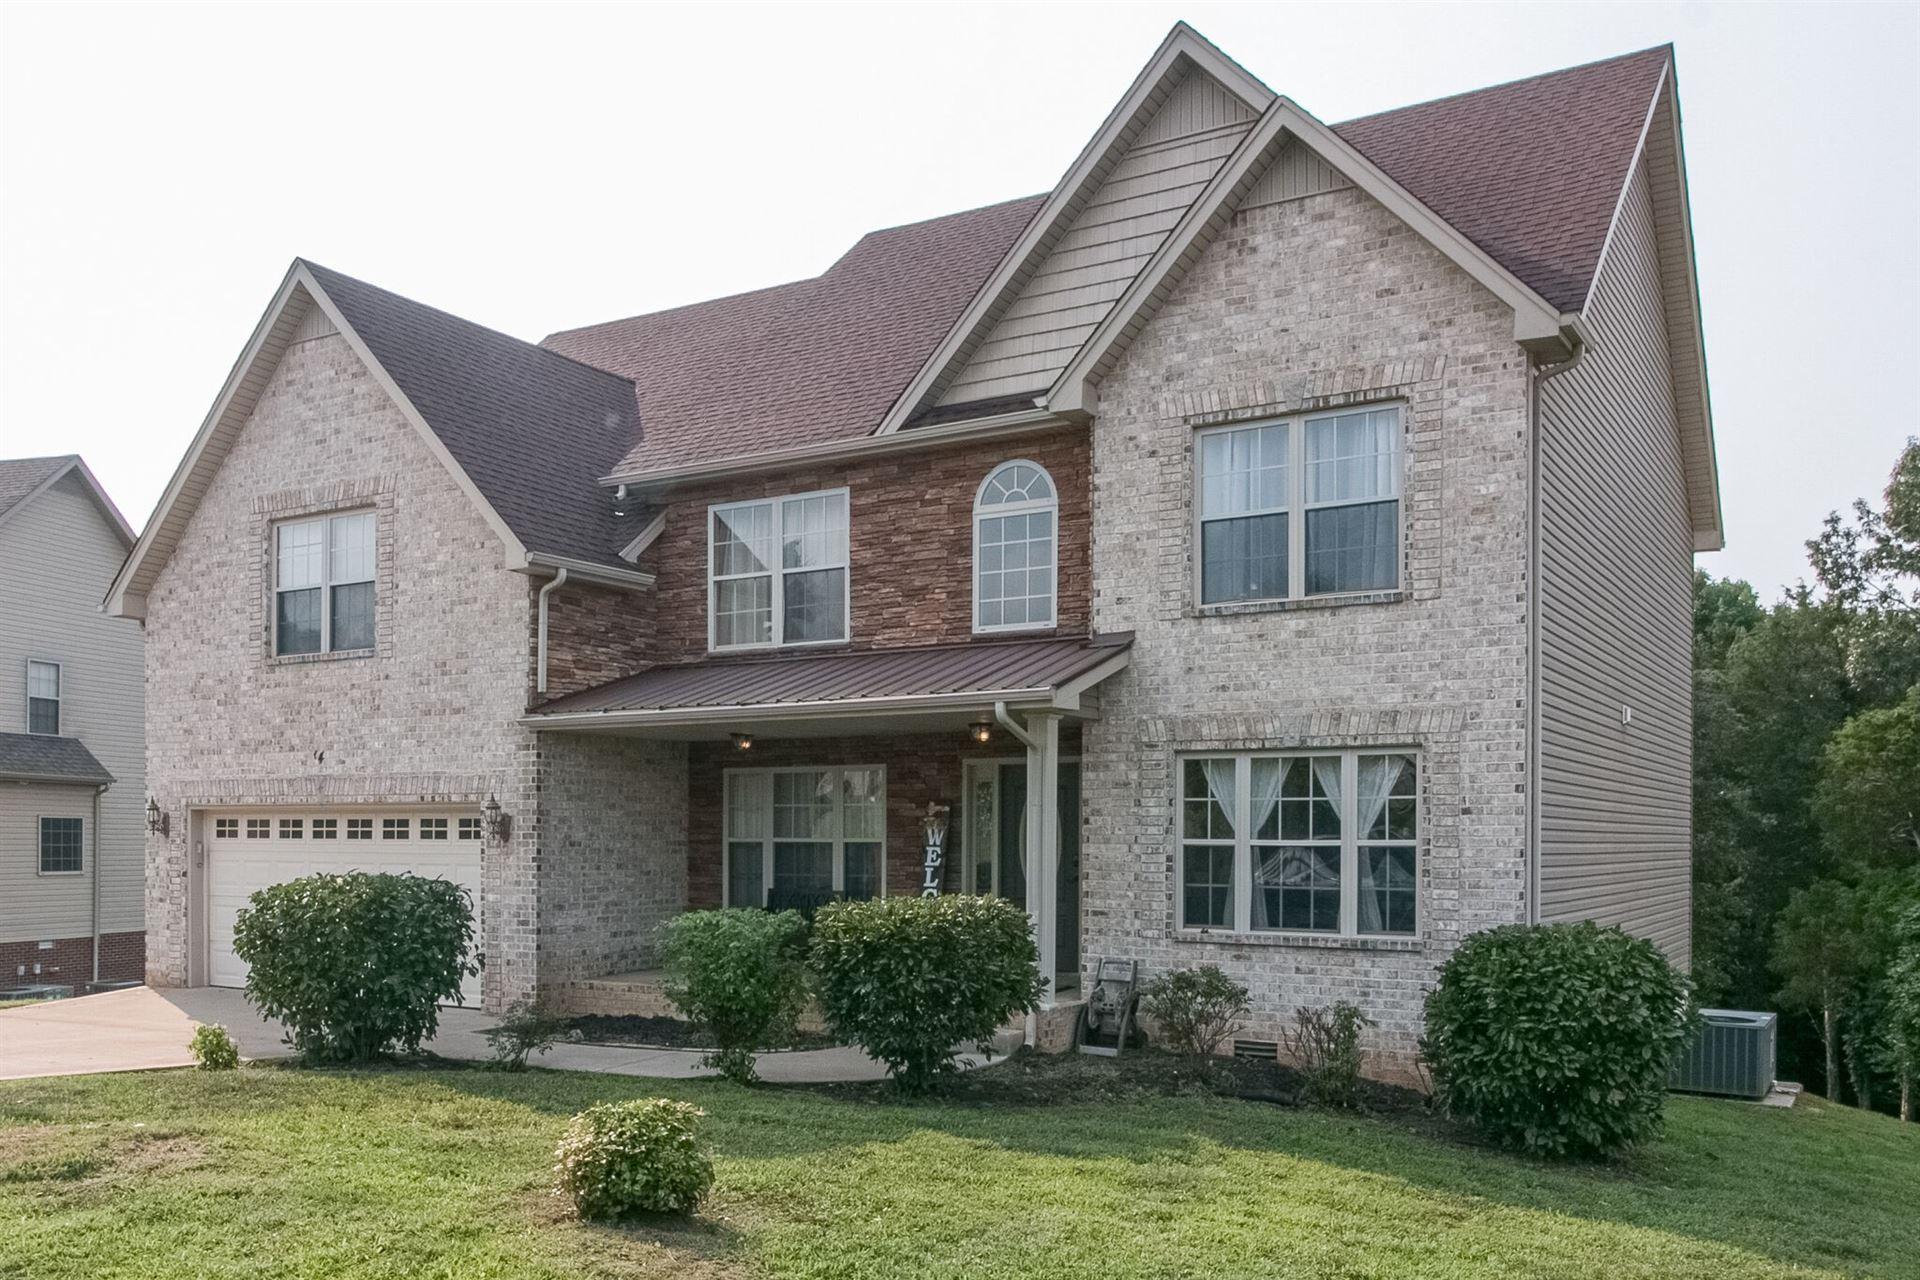 546 Winding Bluff Way, Clarksville, TN 37040 - MLS#: 2274065